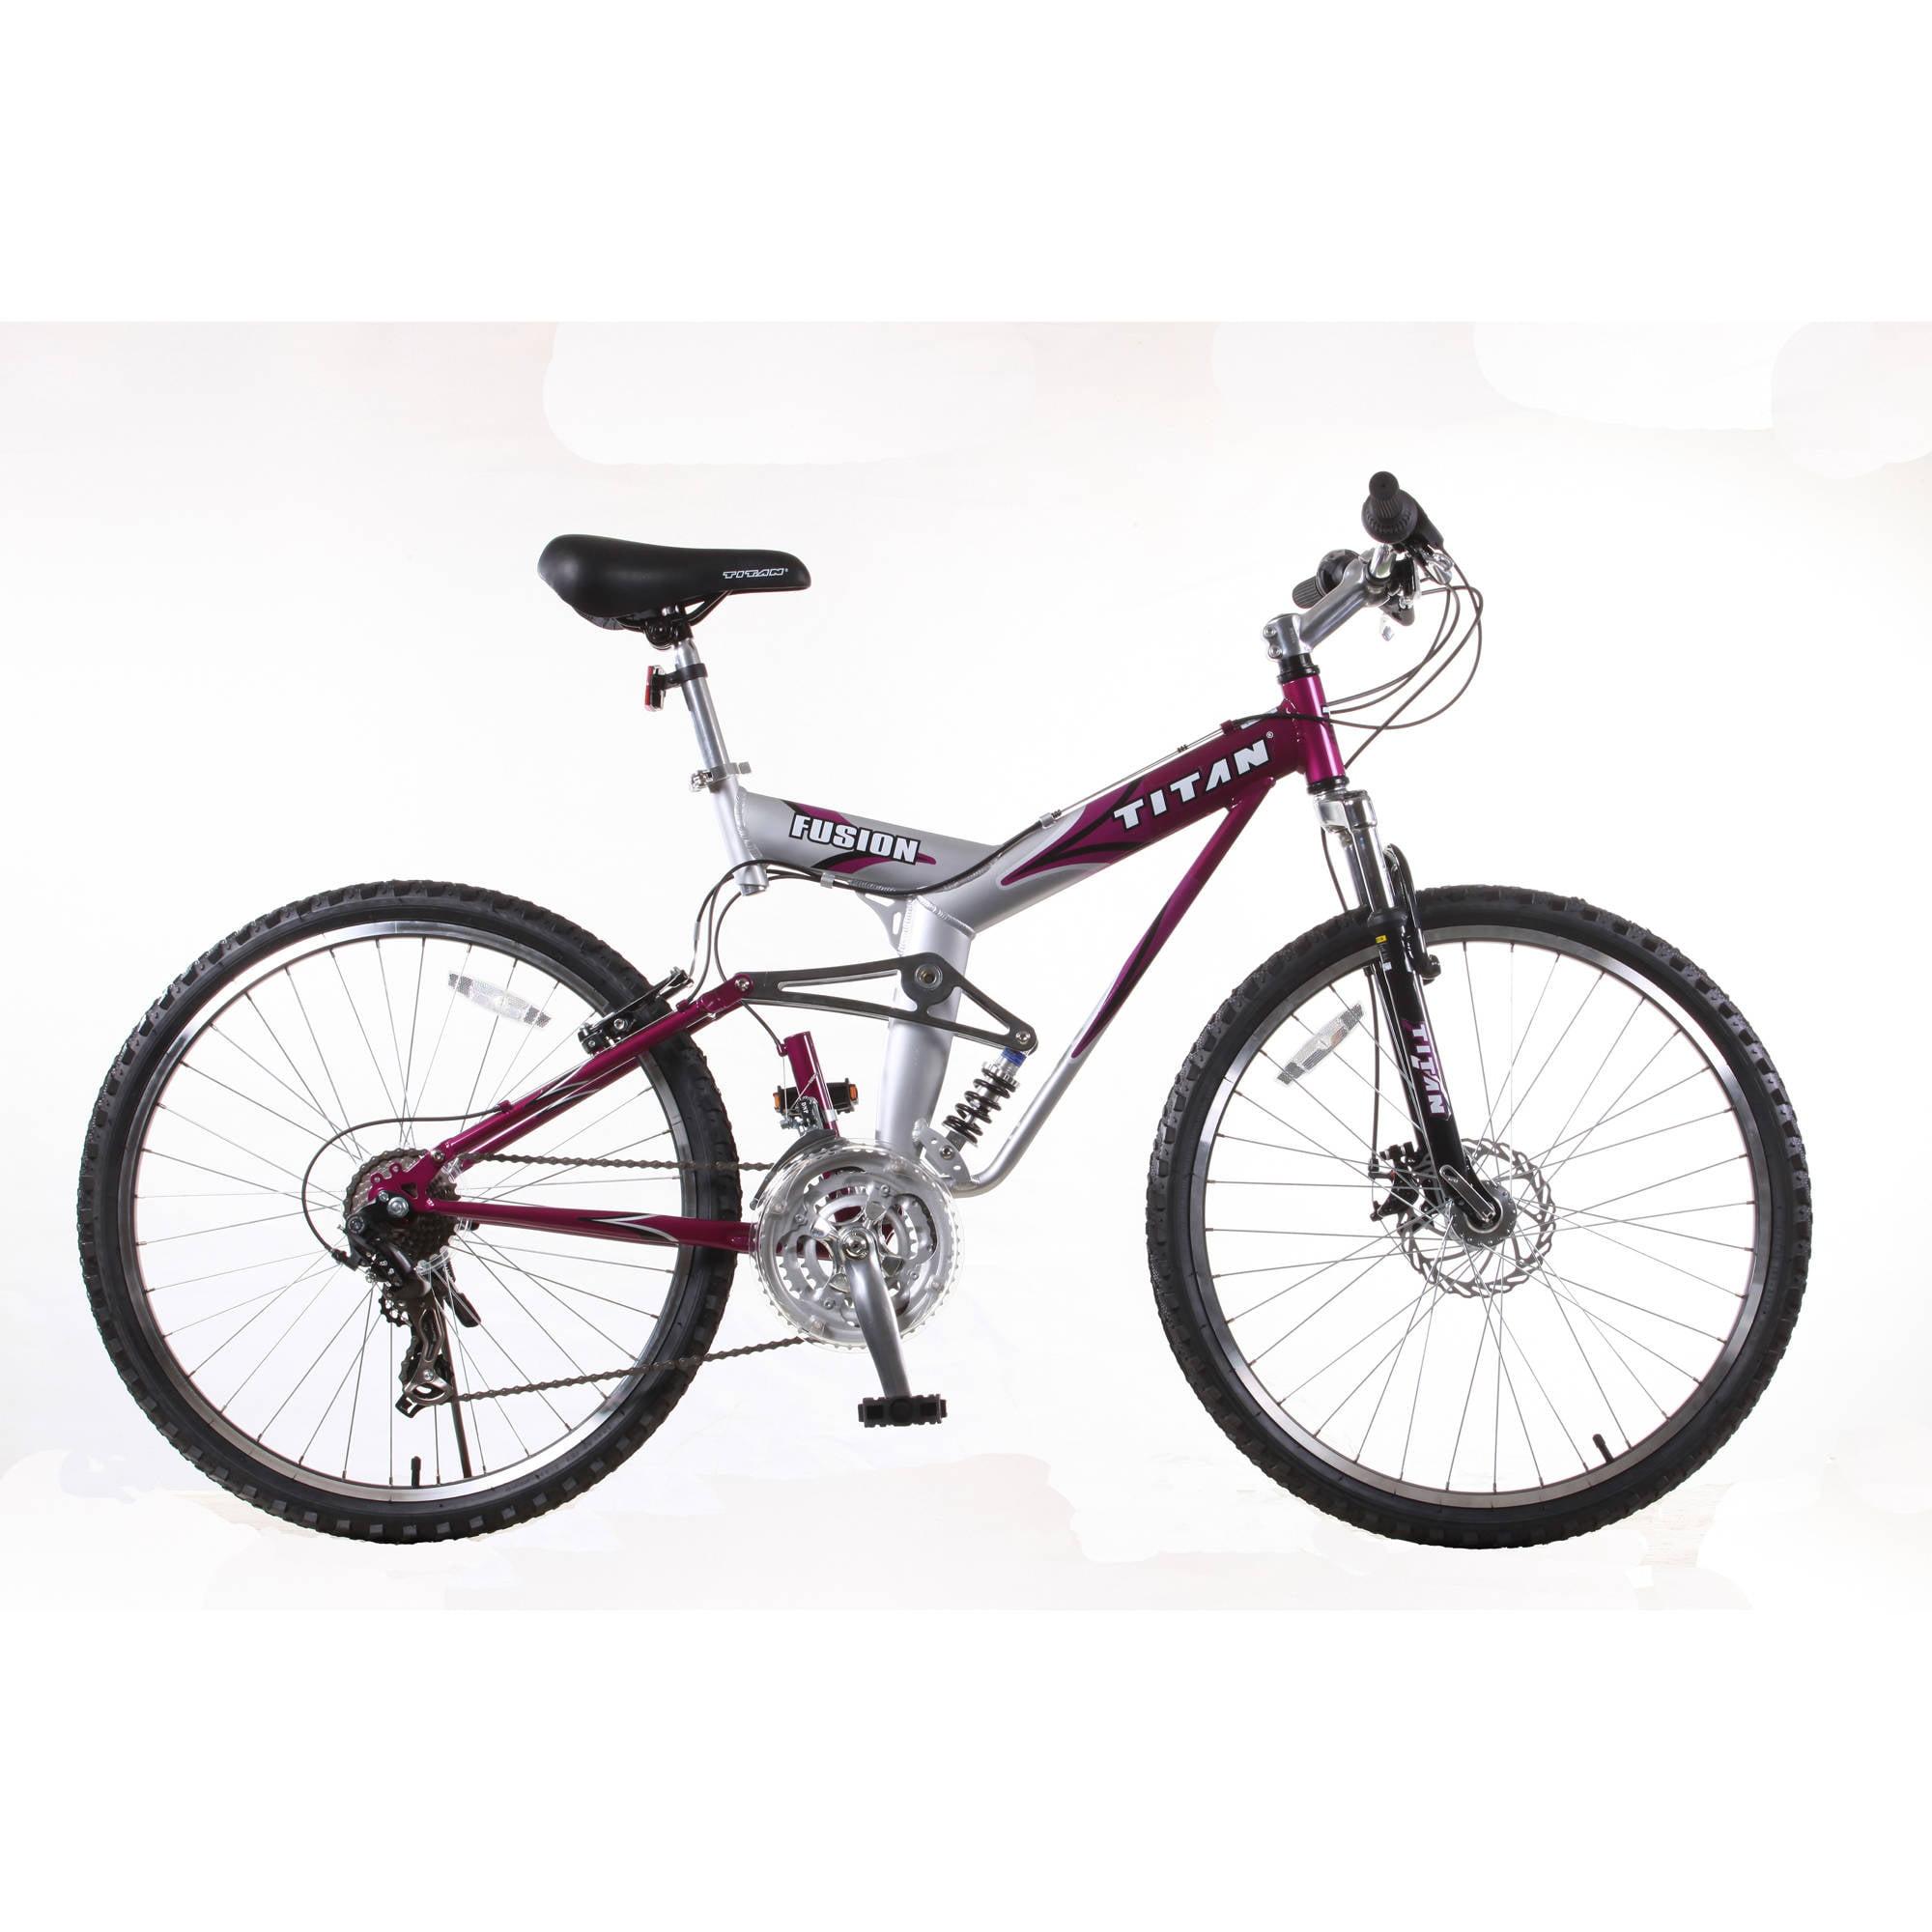 TITAN Fusion PRO Womens' Alloy Dual Suspension All Terrain 21-Speed Mountain Bike, Purple